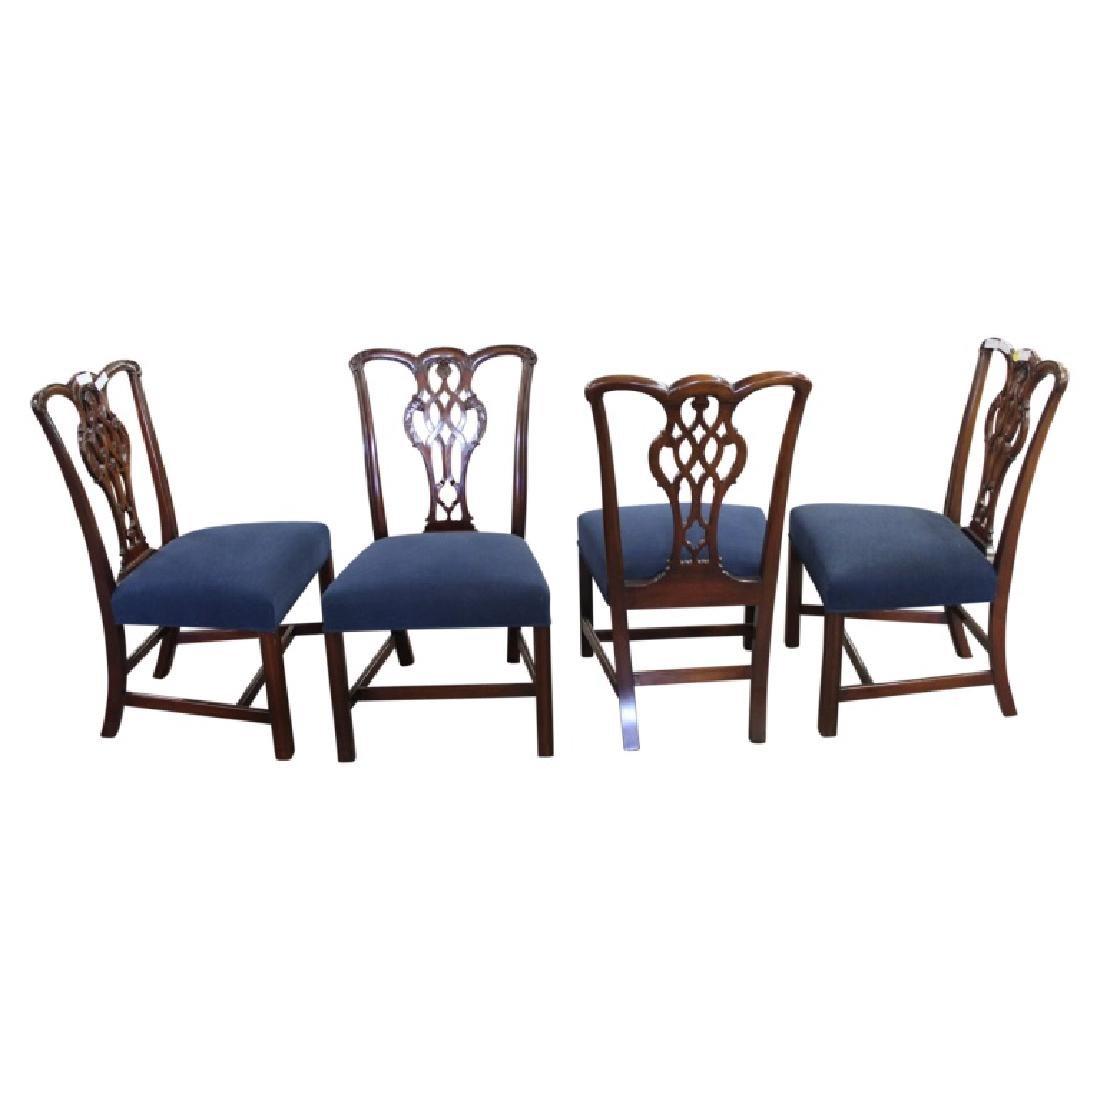 Schmieg & Kotztan Dining Chairs - 8 PCS - 9